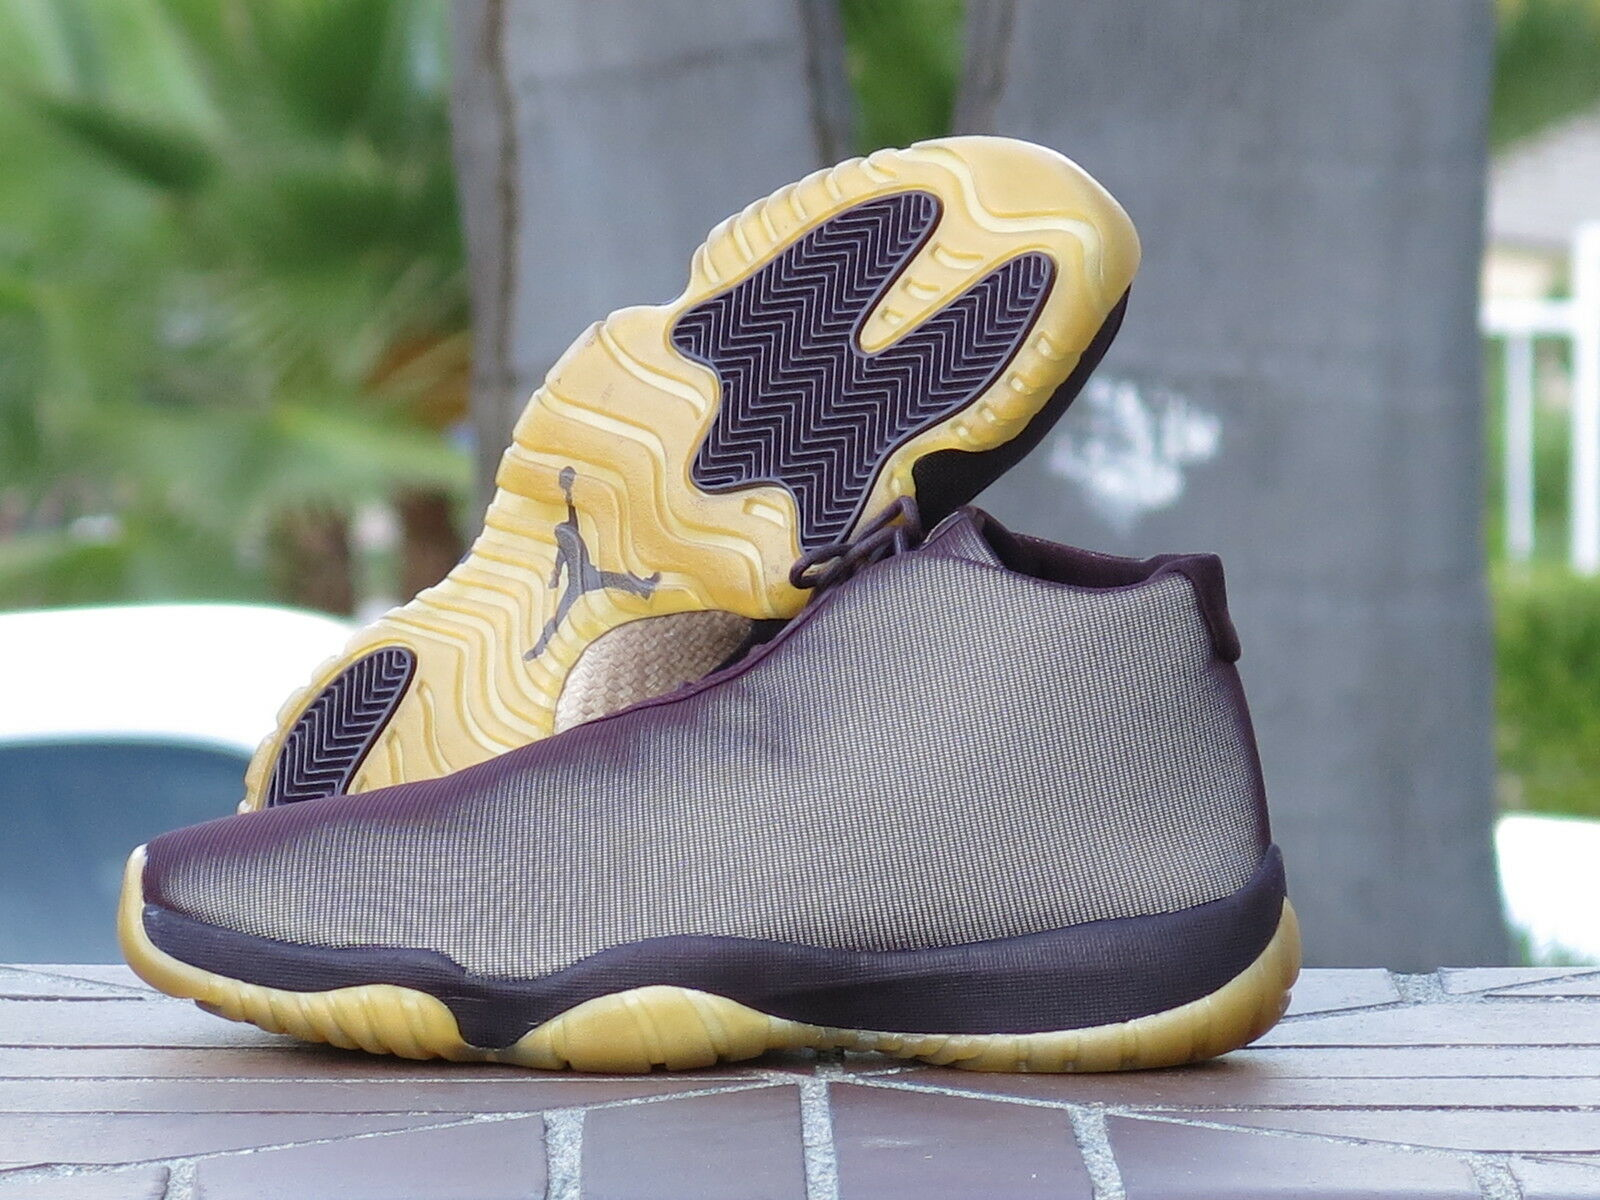 Nike Air Jordan Future 656503-670 FootScape Men's Basketball Shoes 656503-670 Future SZ 12 55f821